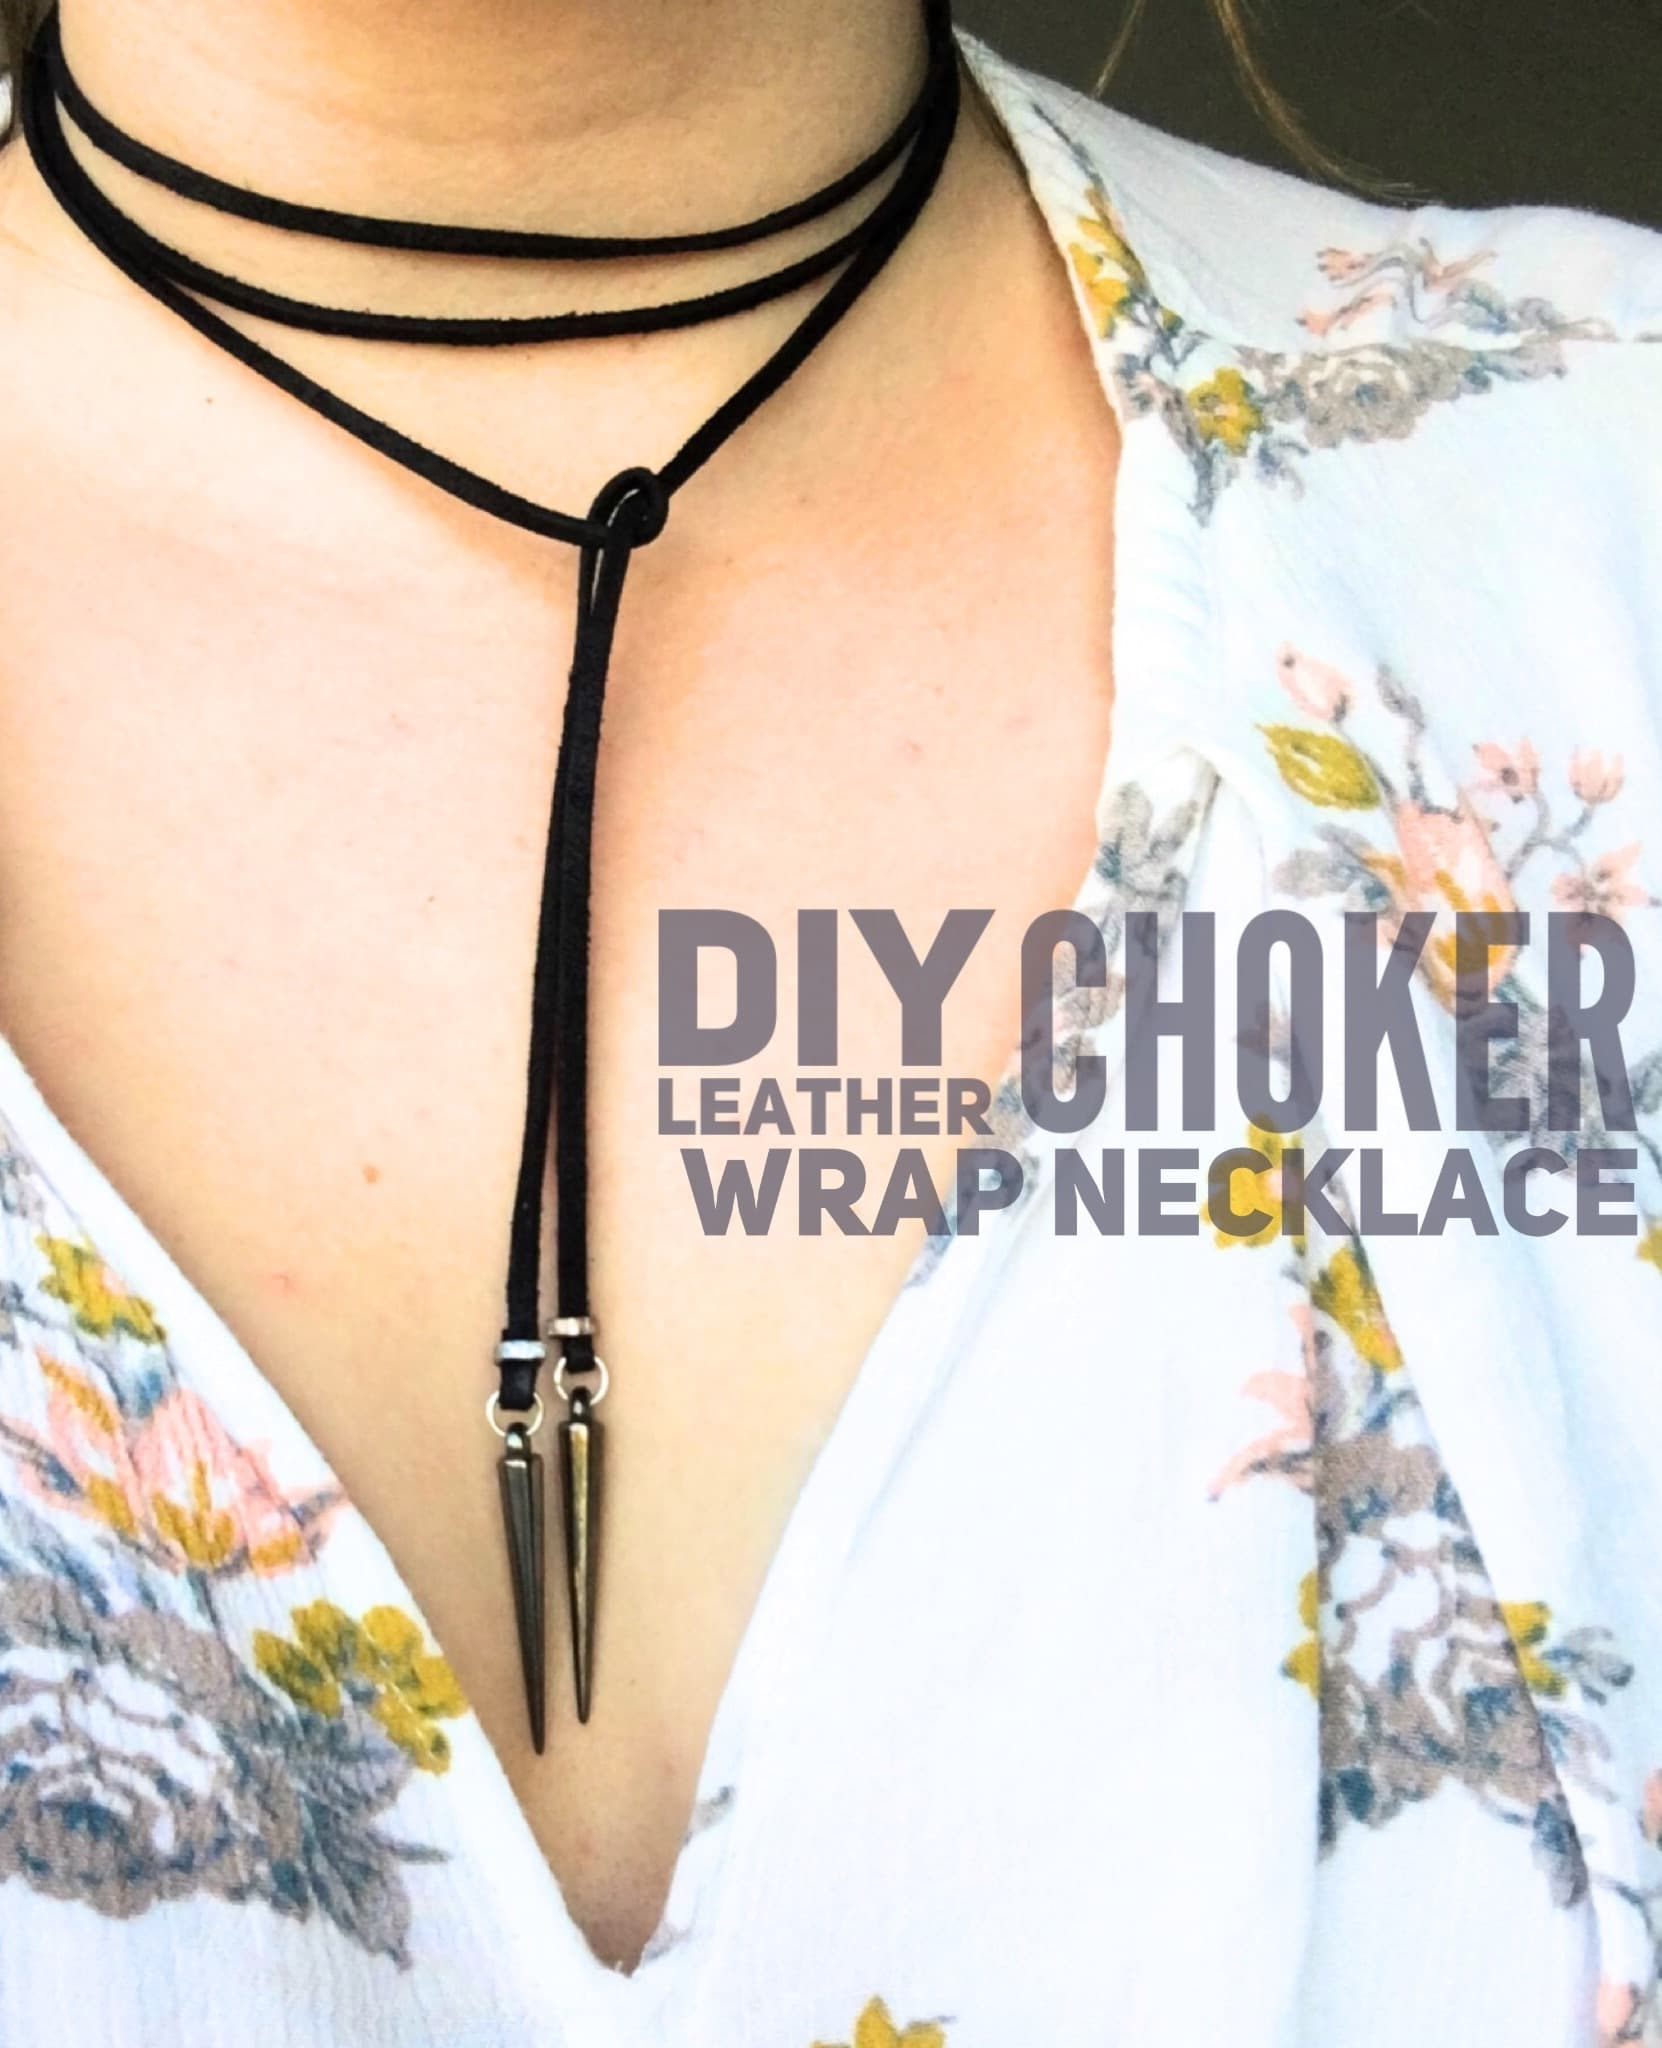 DIY Leather Choker Wrap Necklace